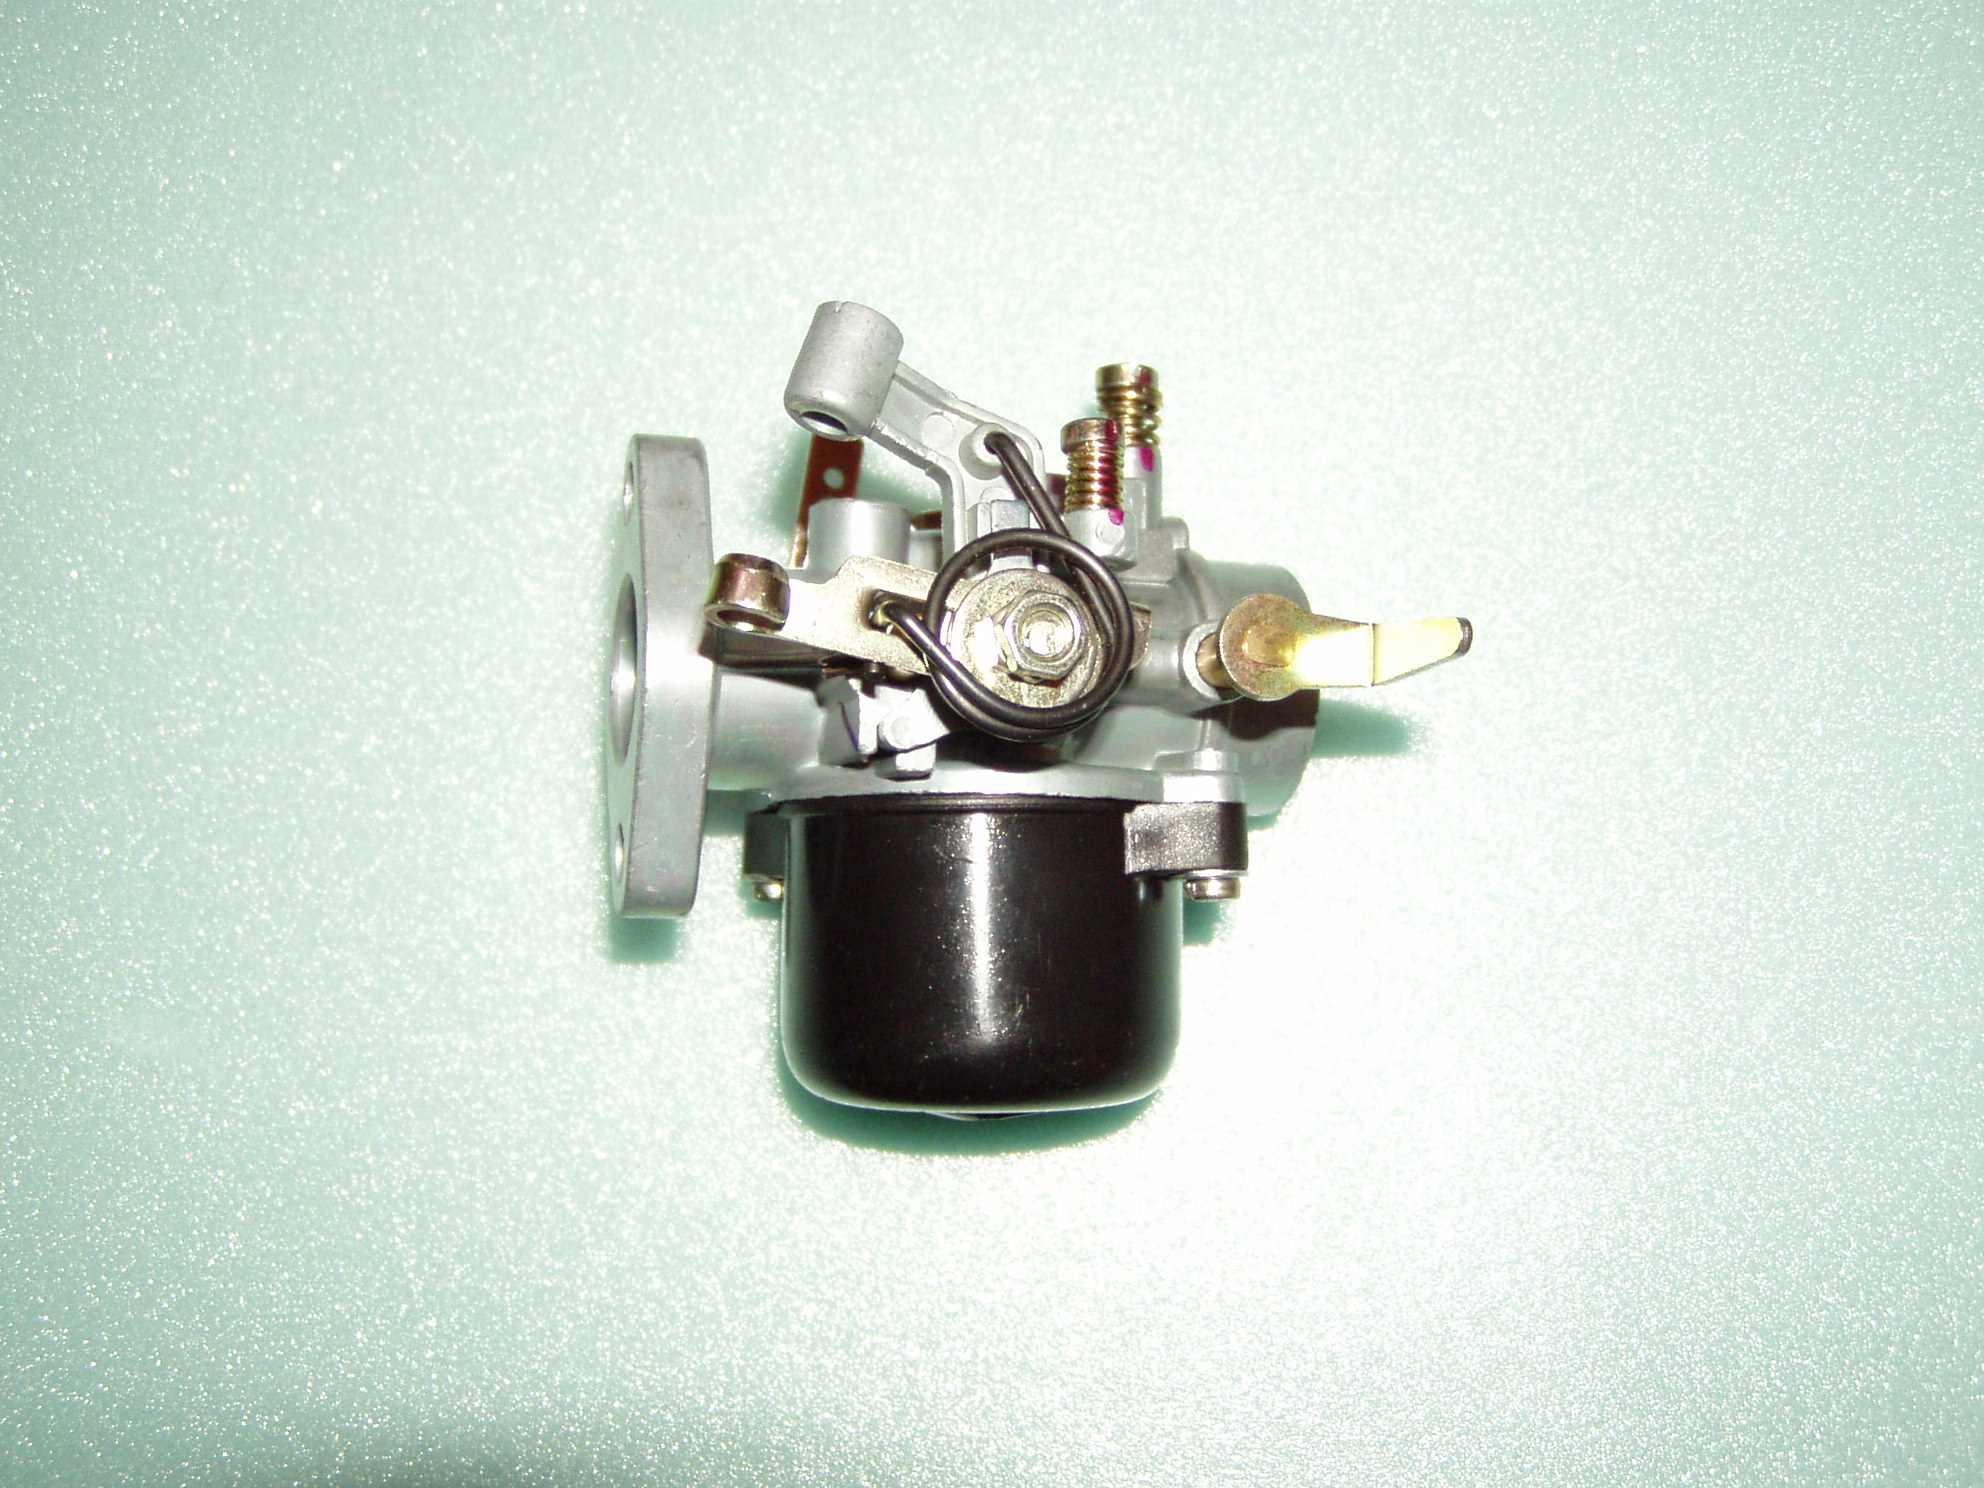 Karburátor VARI JIKOV 5 HP s tryskou 82